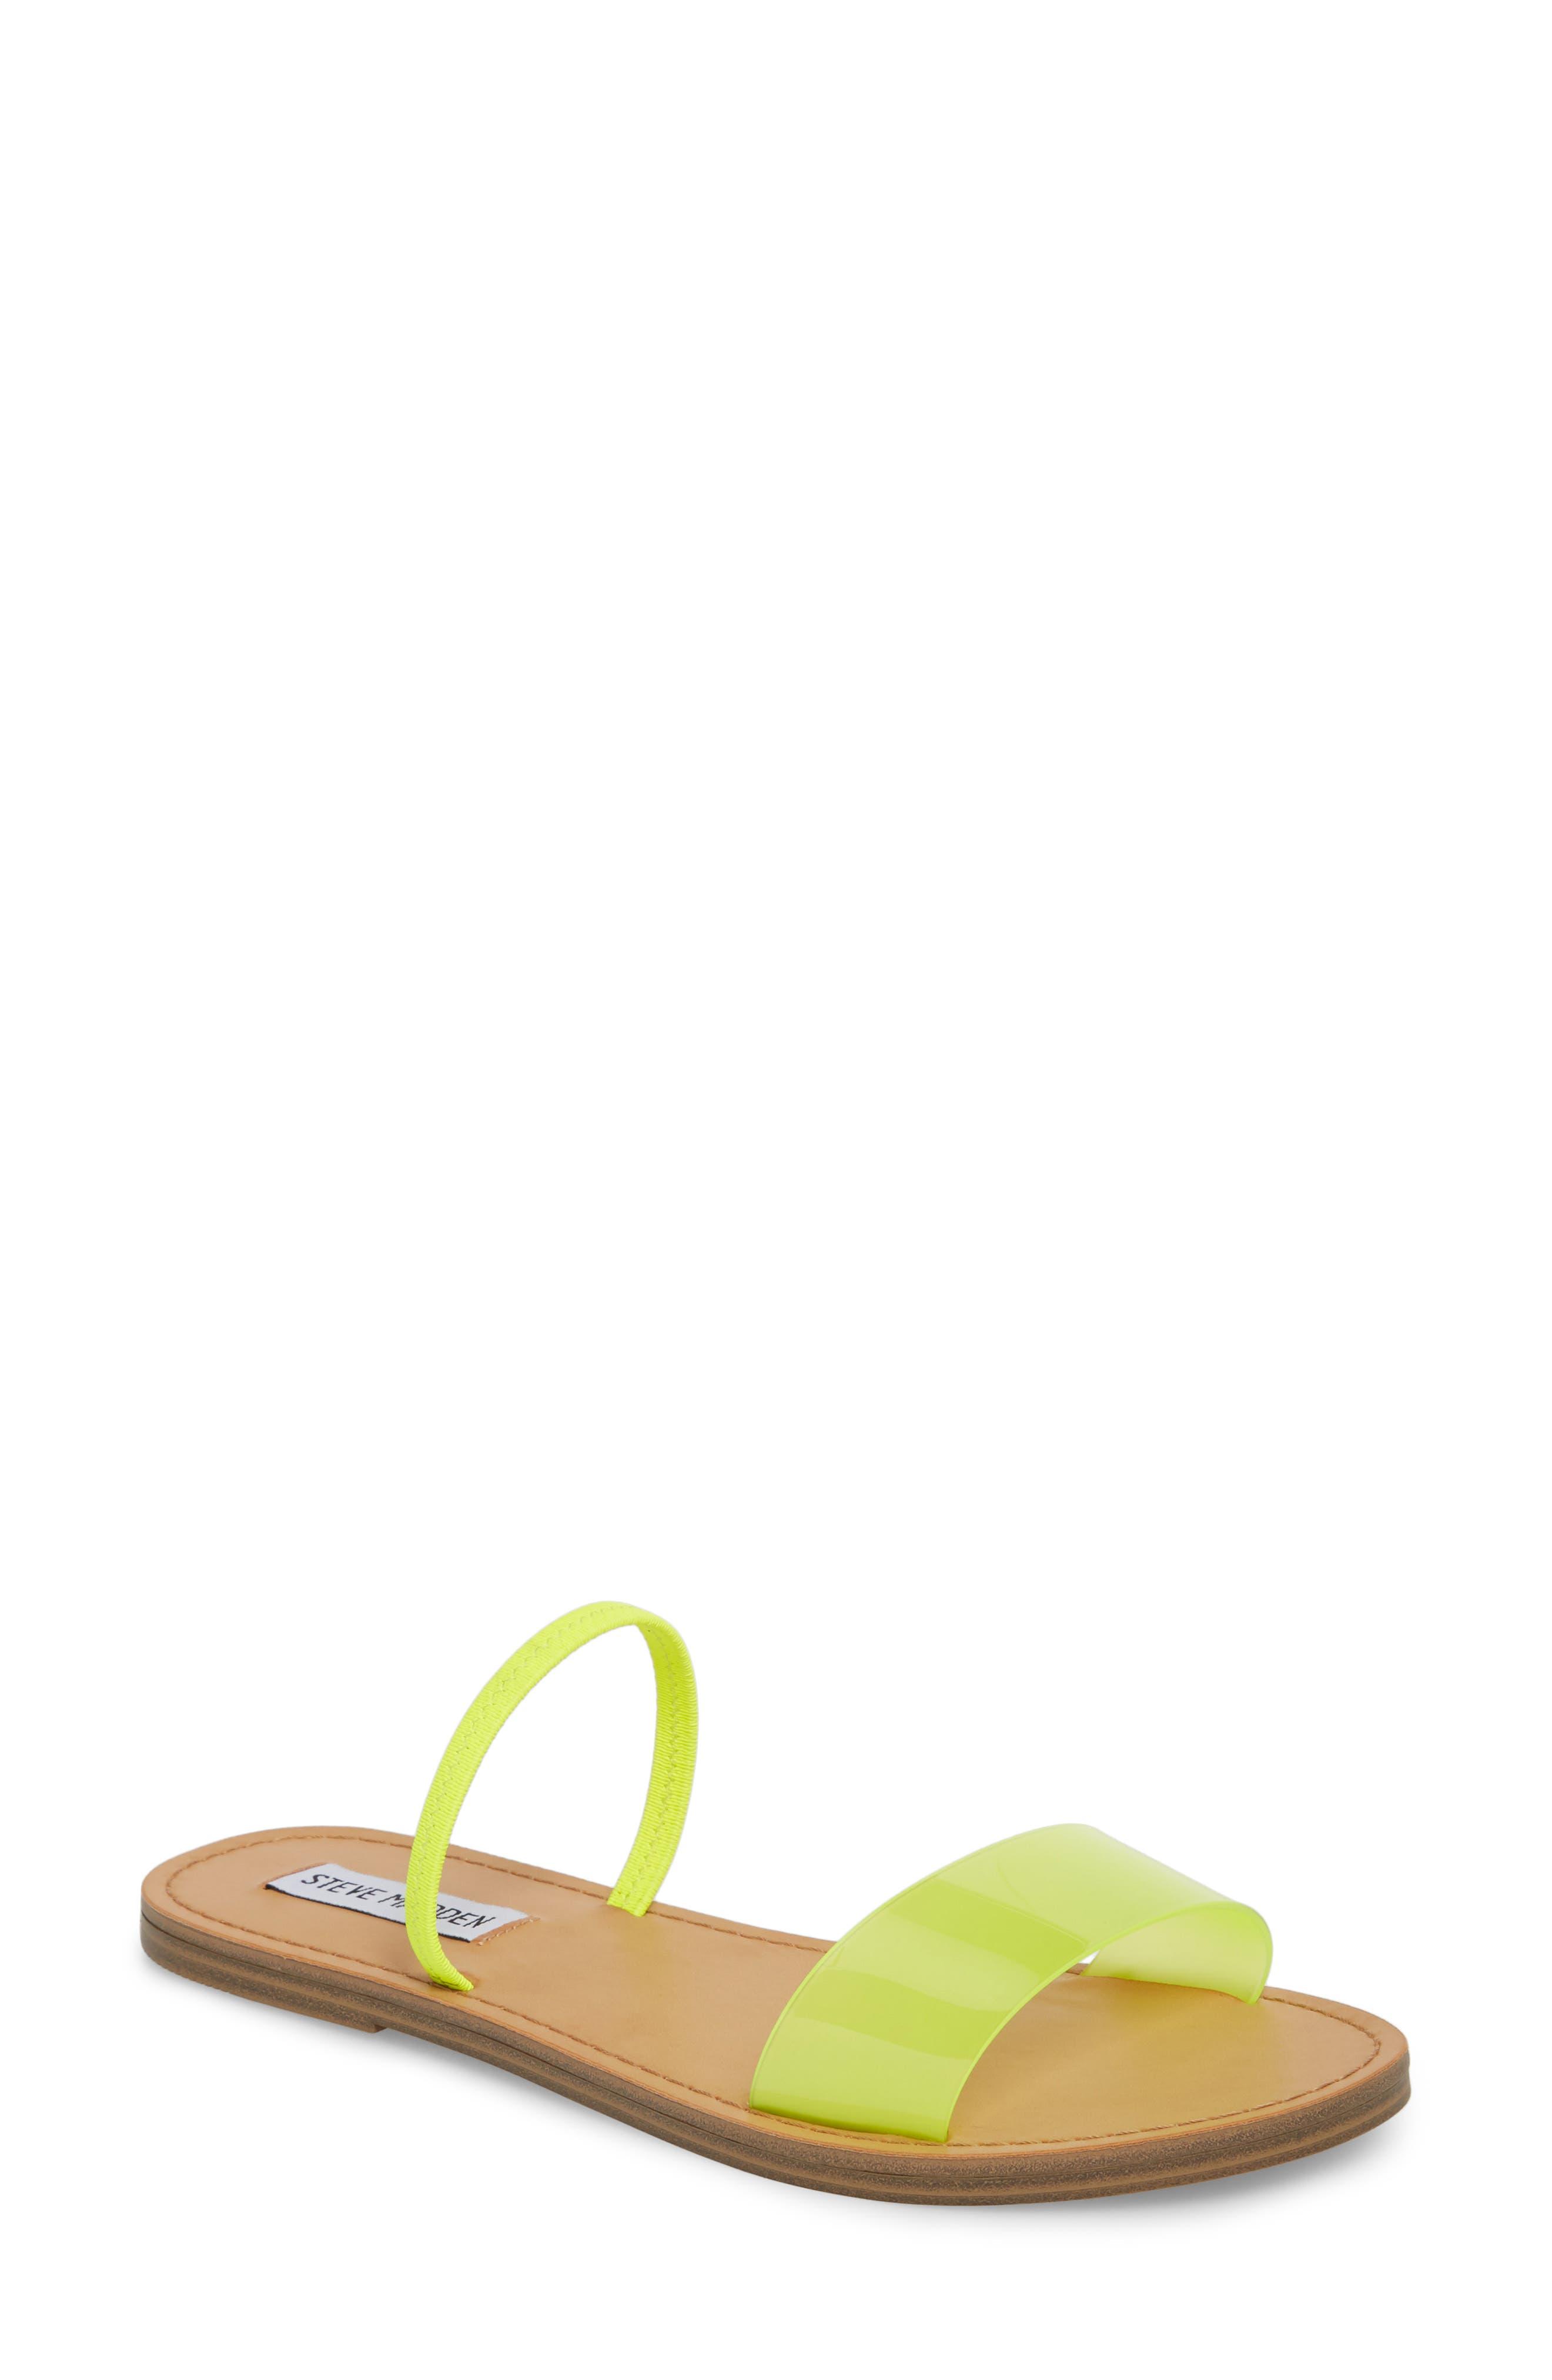 Dasha Strappy Slide Sandal,                             Main thumbnail 3, color,